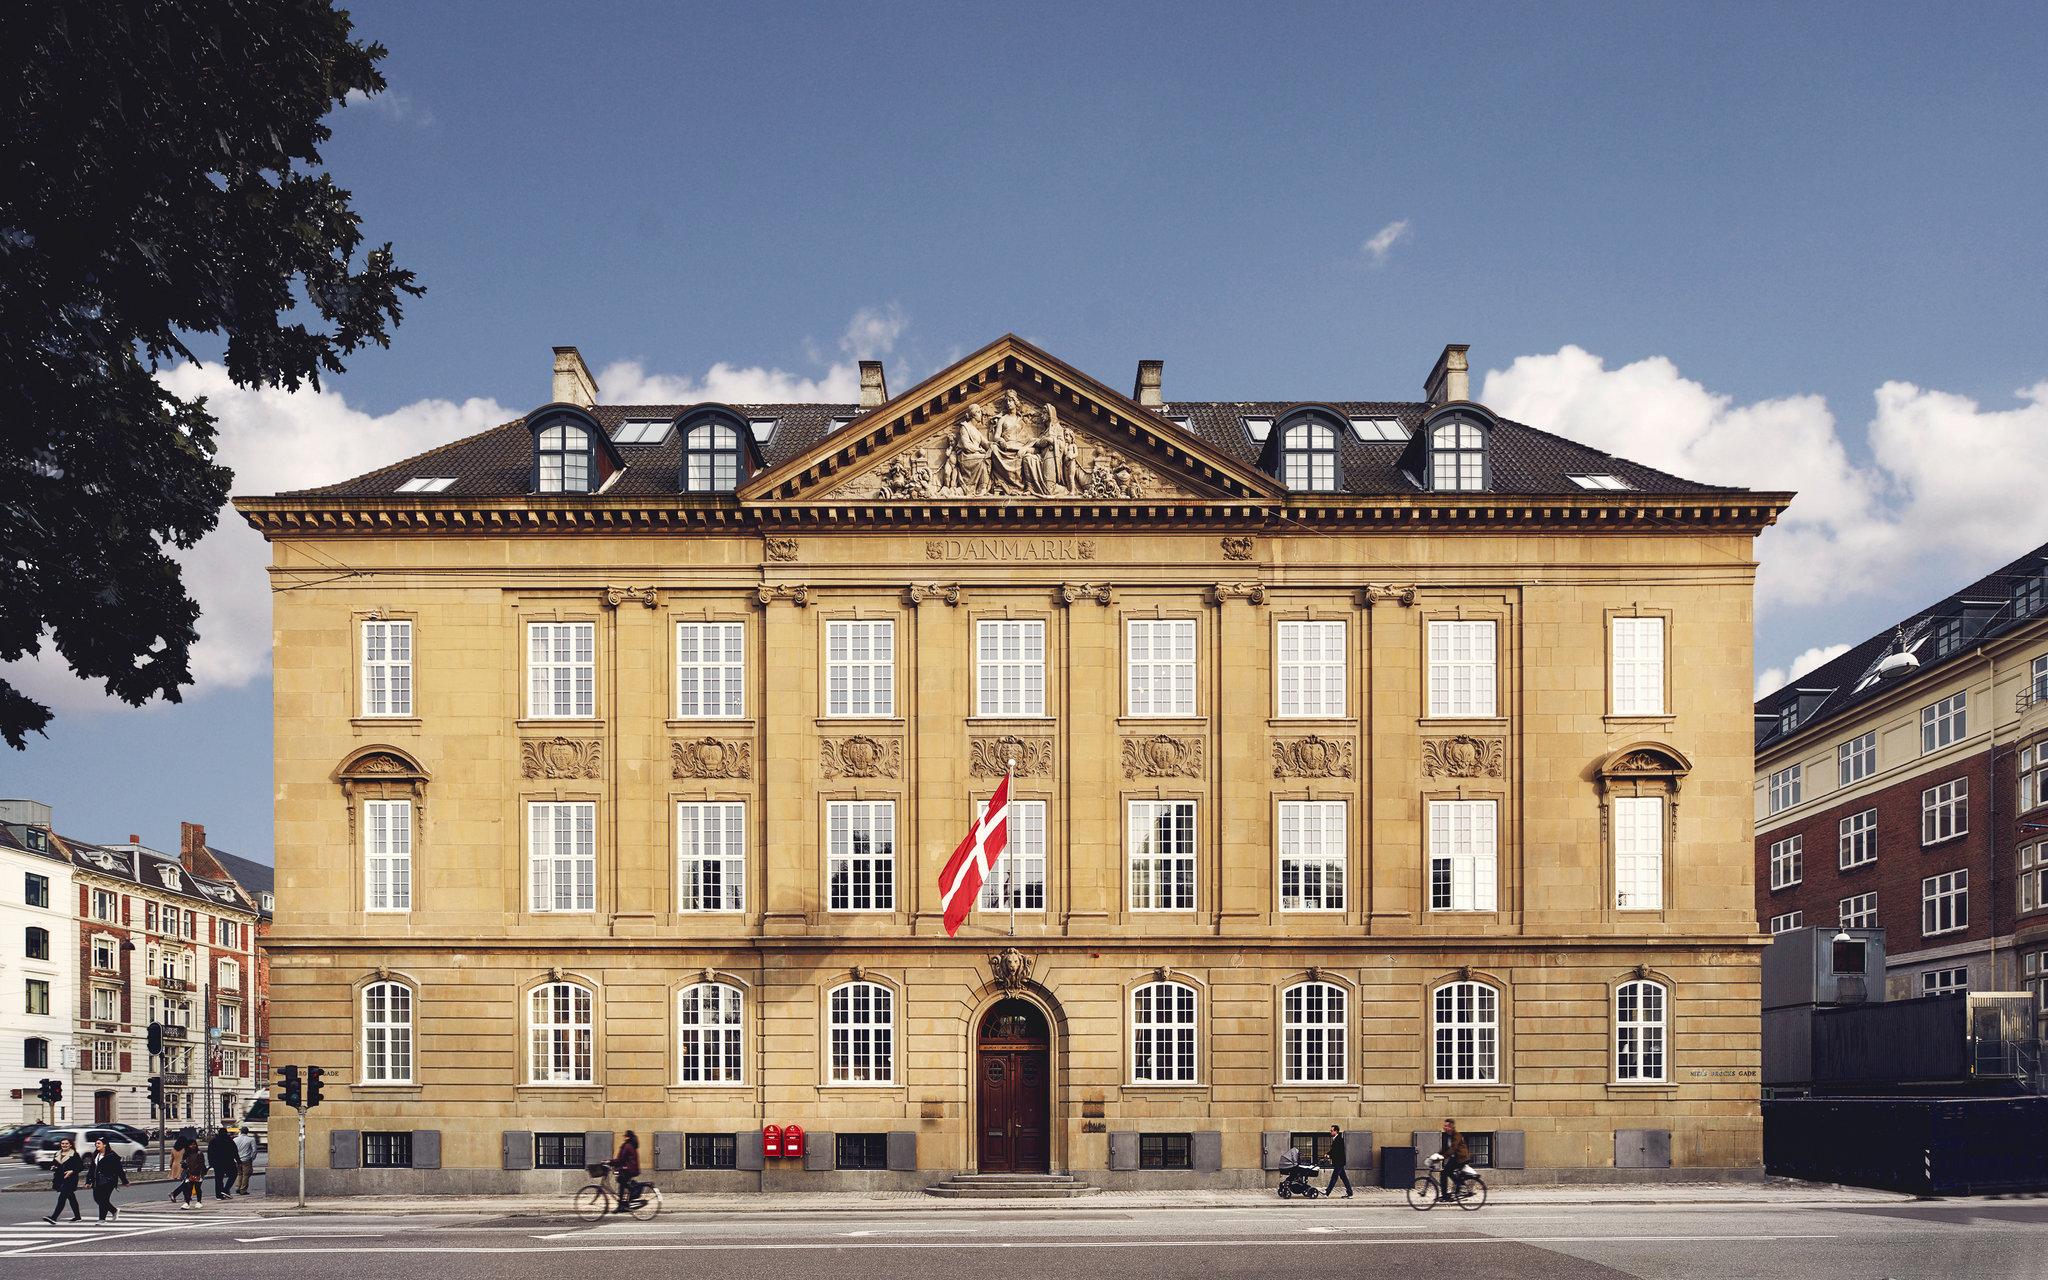 Nobis Hotel Copenhagen, a Design Hotel